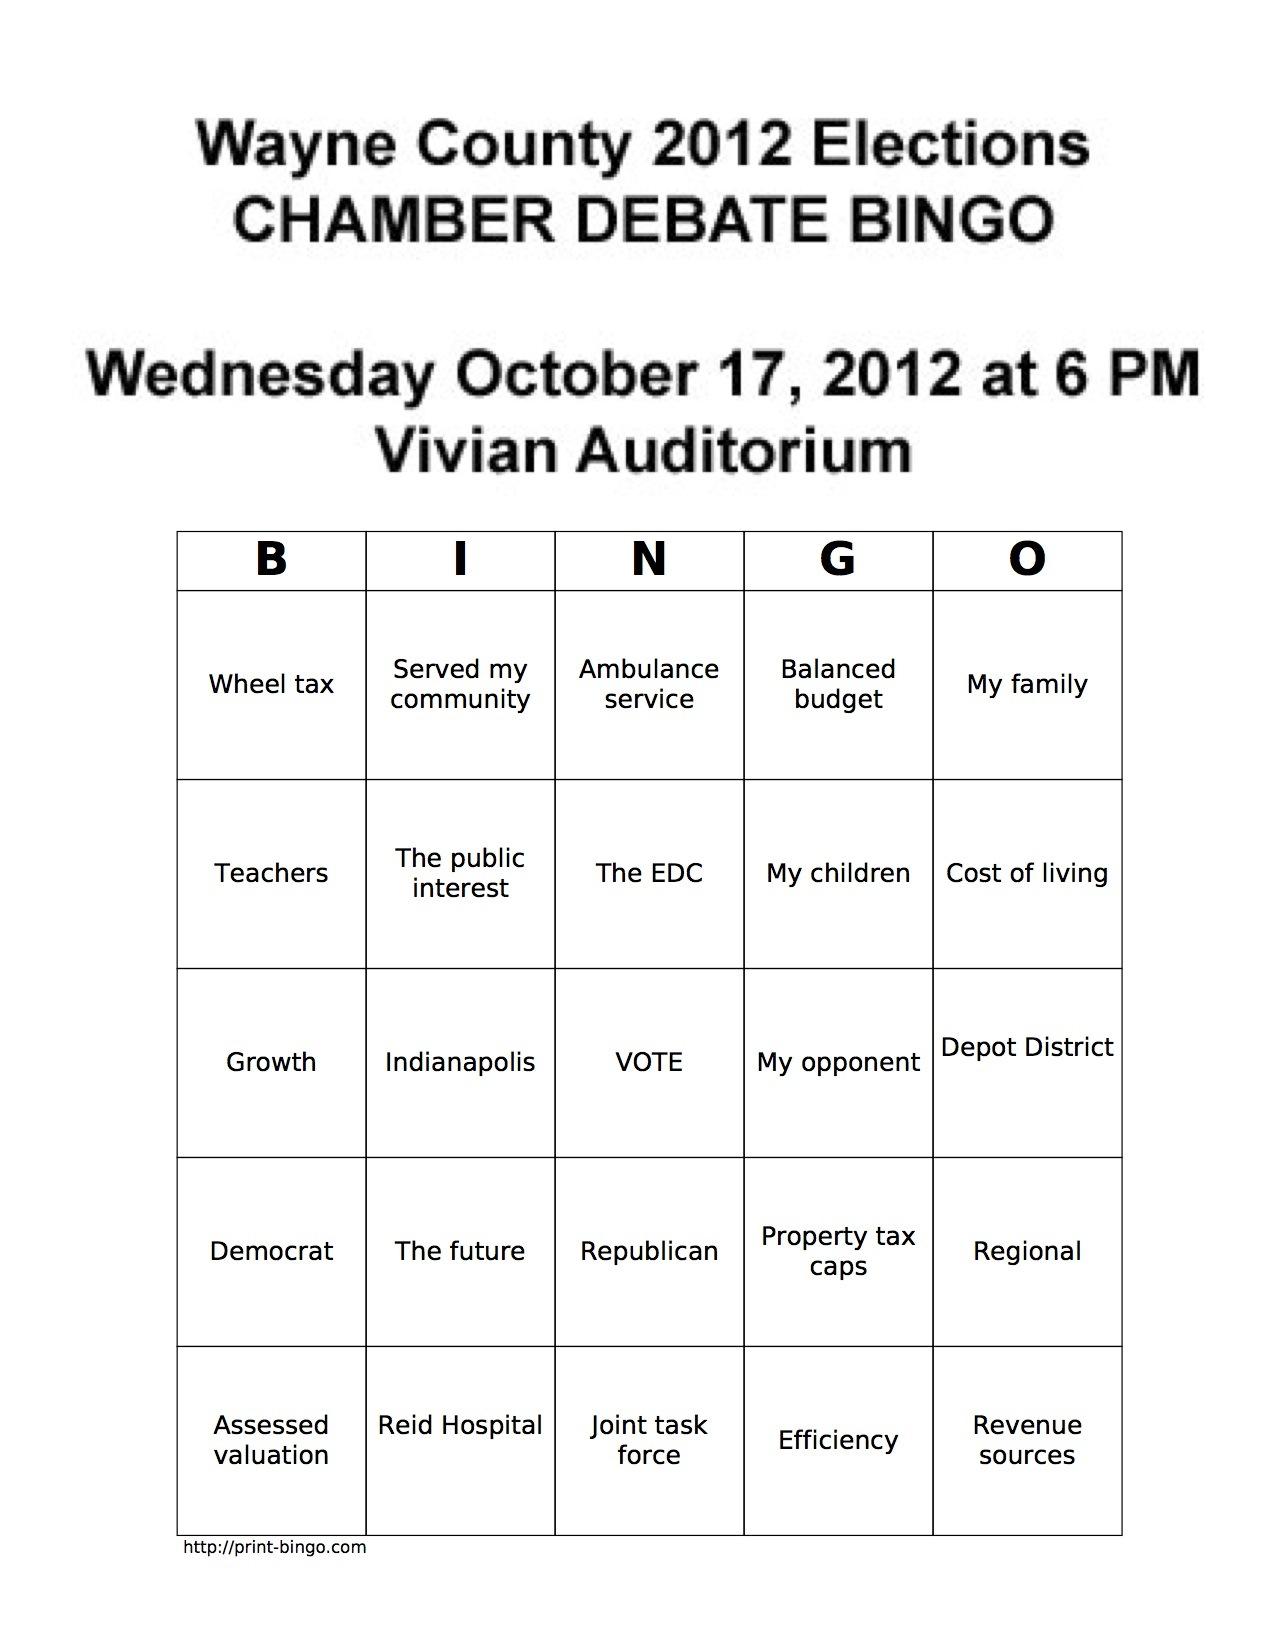 2012 Chamber Debate Bingo Cards